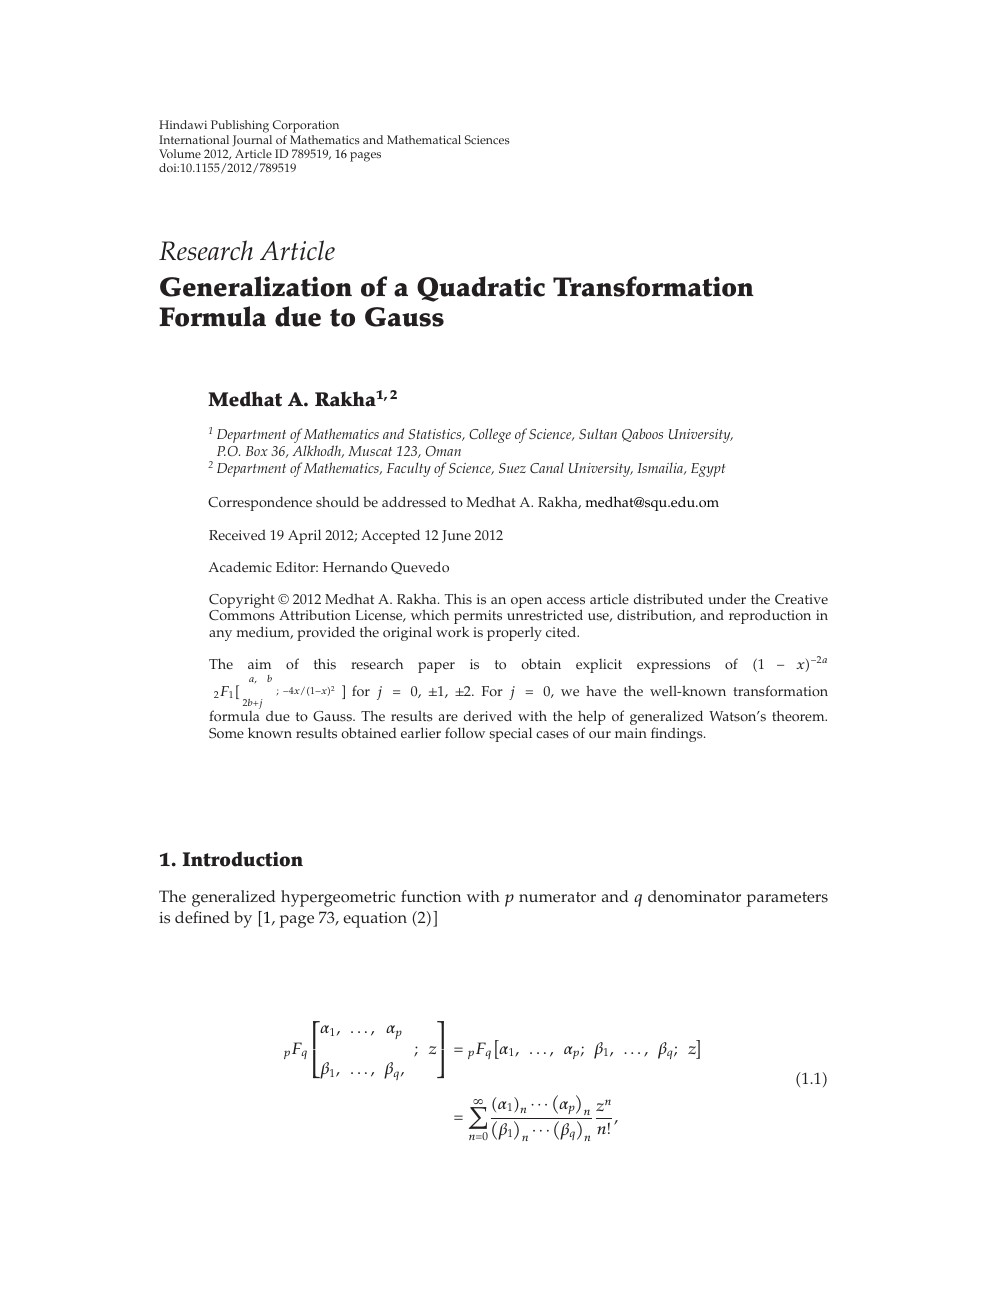 Generalization of a Quadratic Transformation Formula due to Gauss